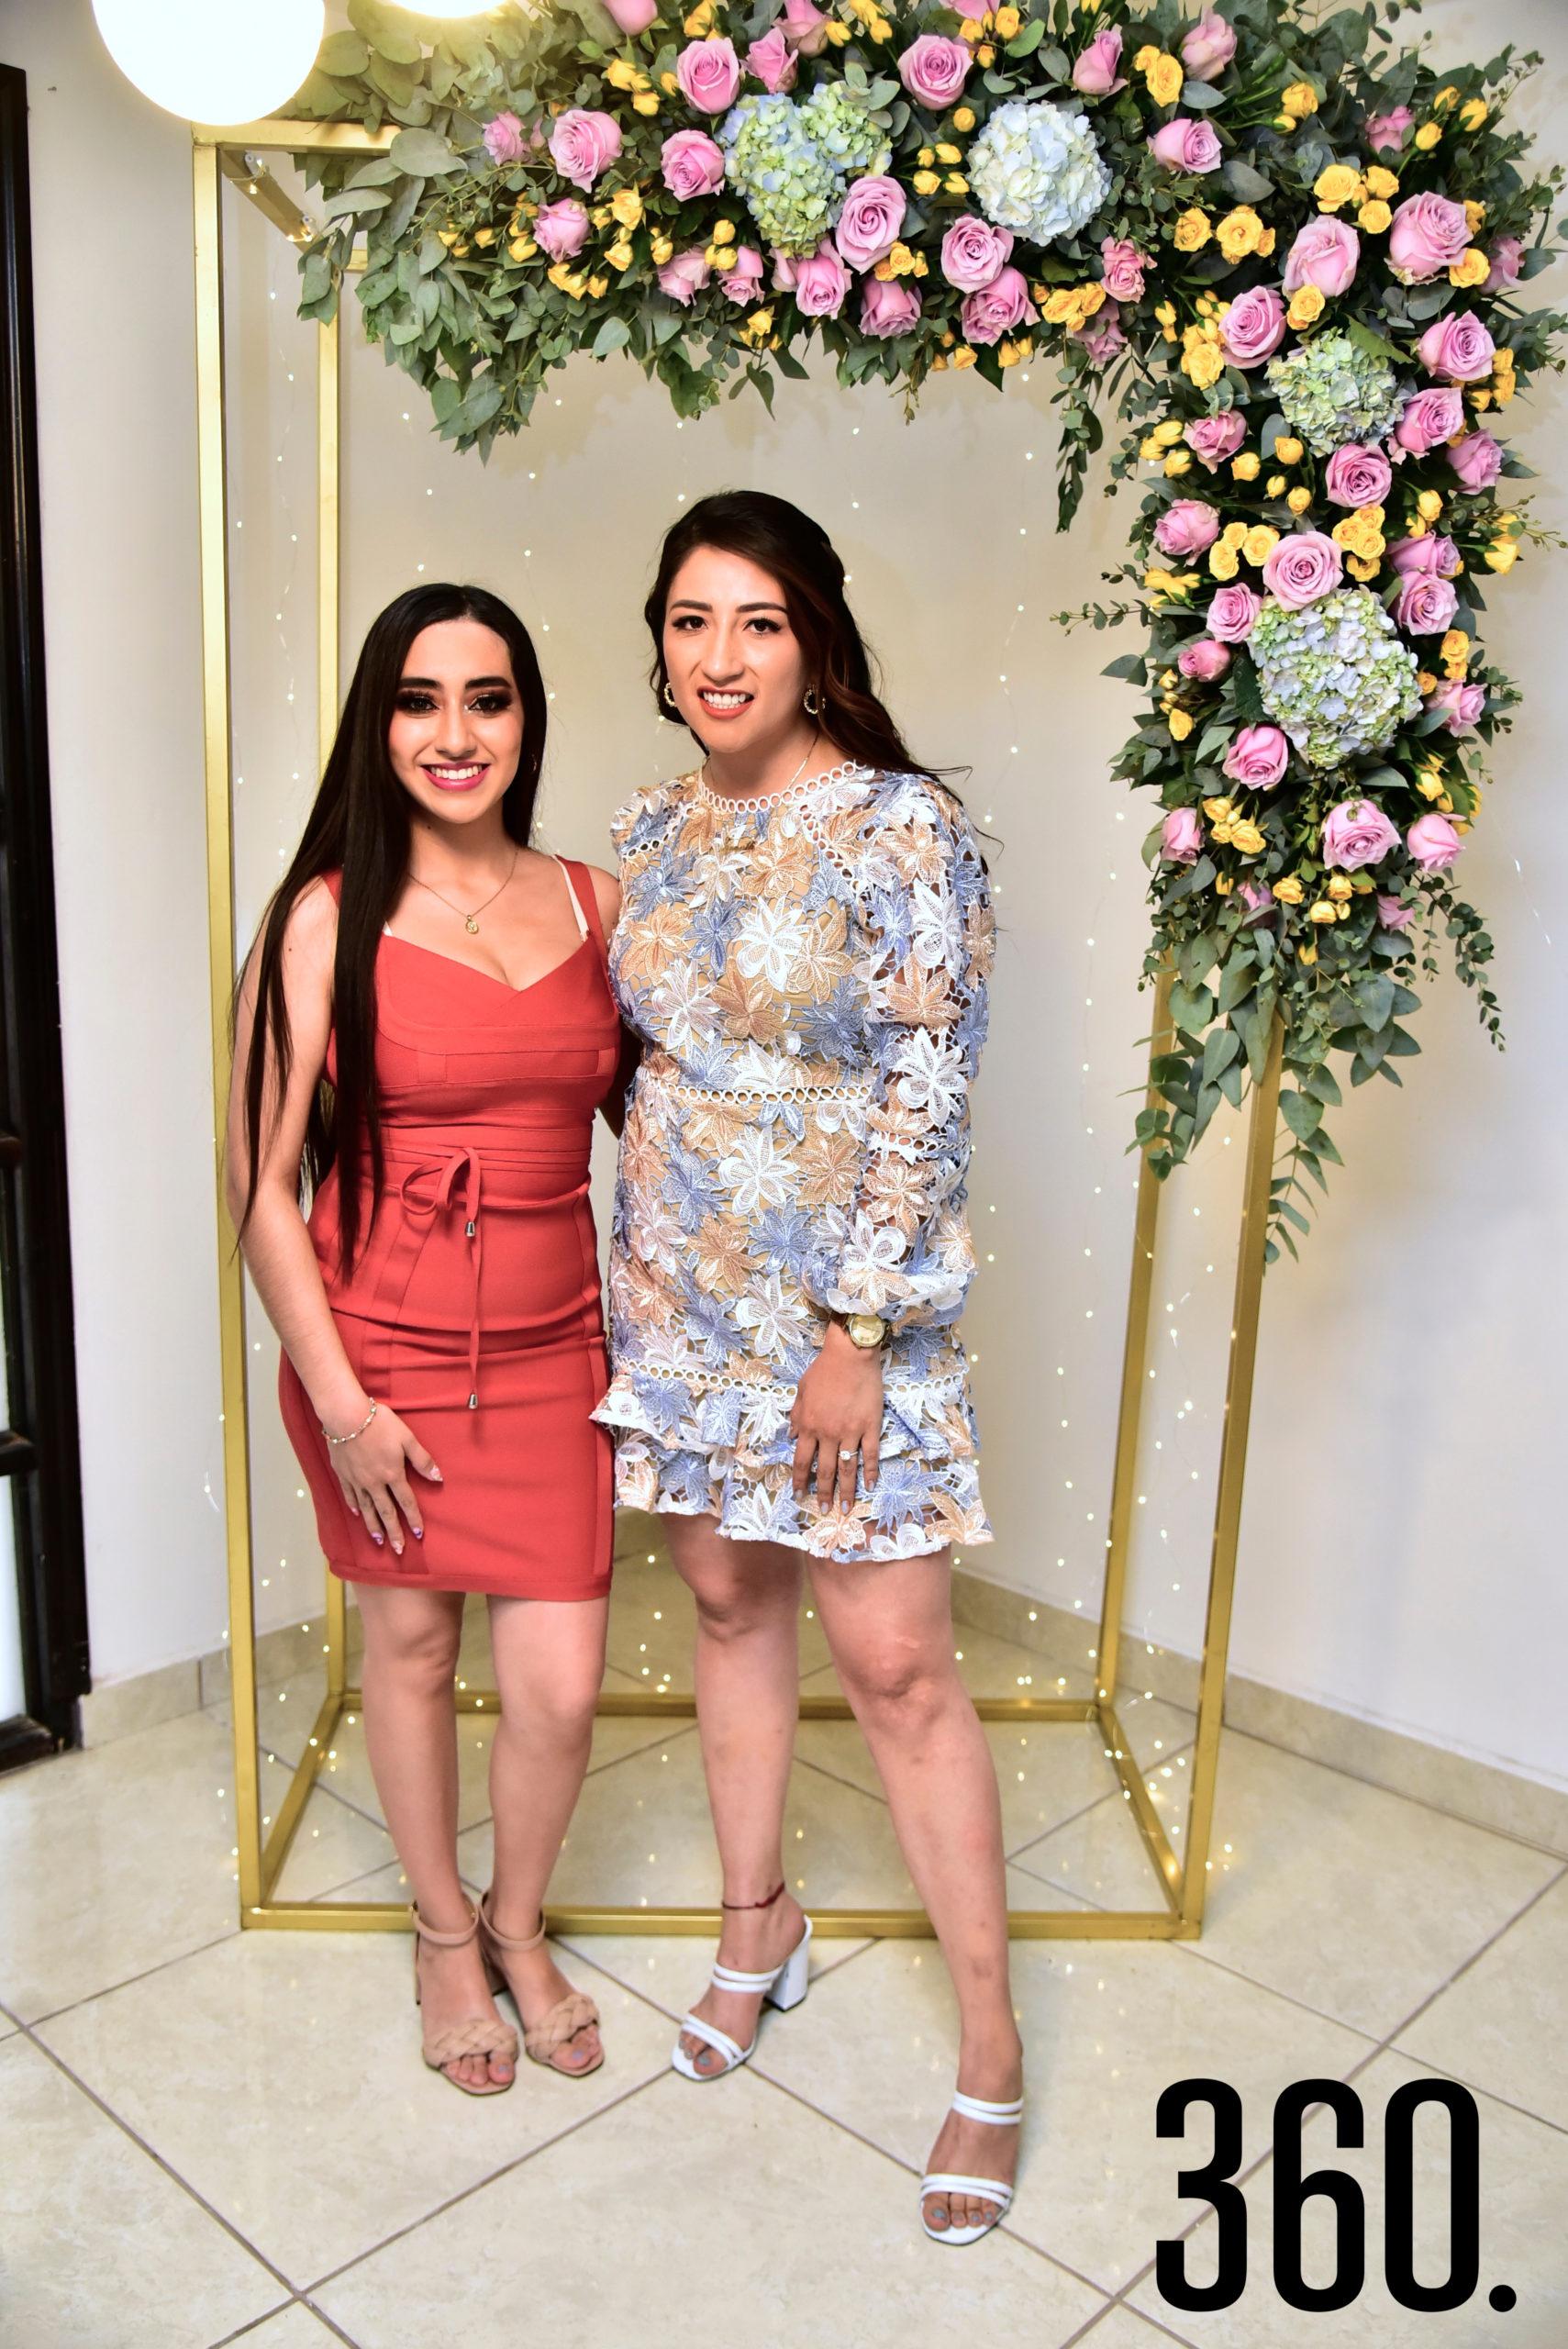 Janeth Espinosa con su hermana Nereida Espinosa.